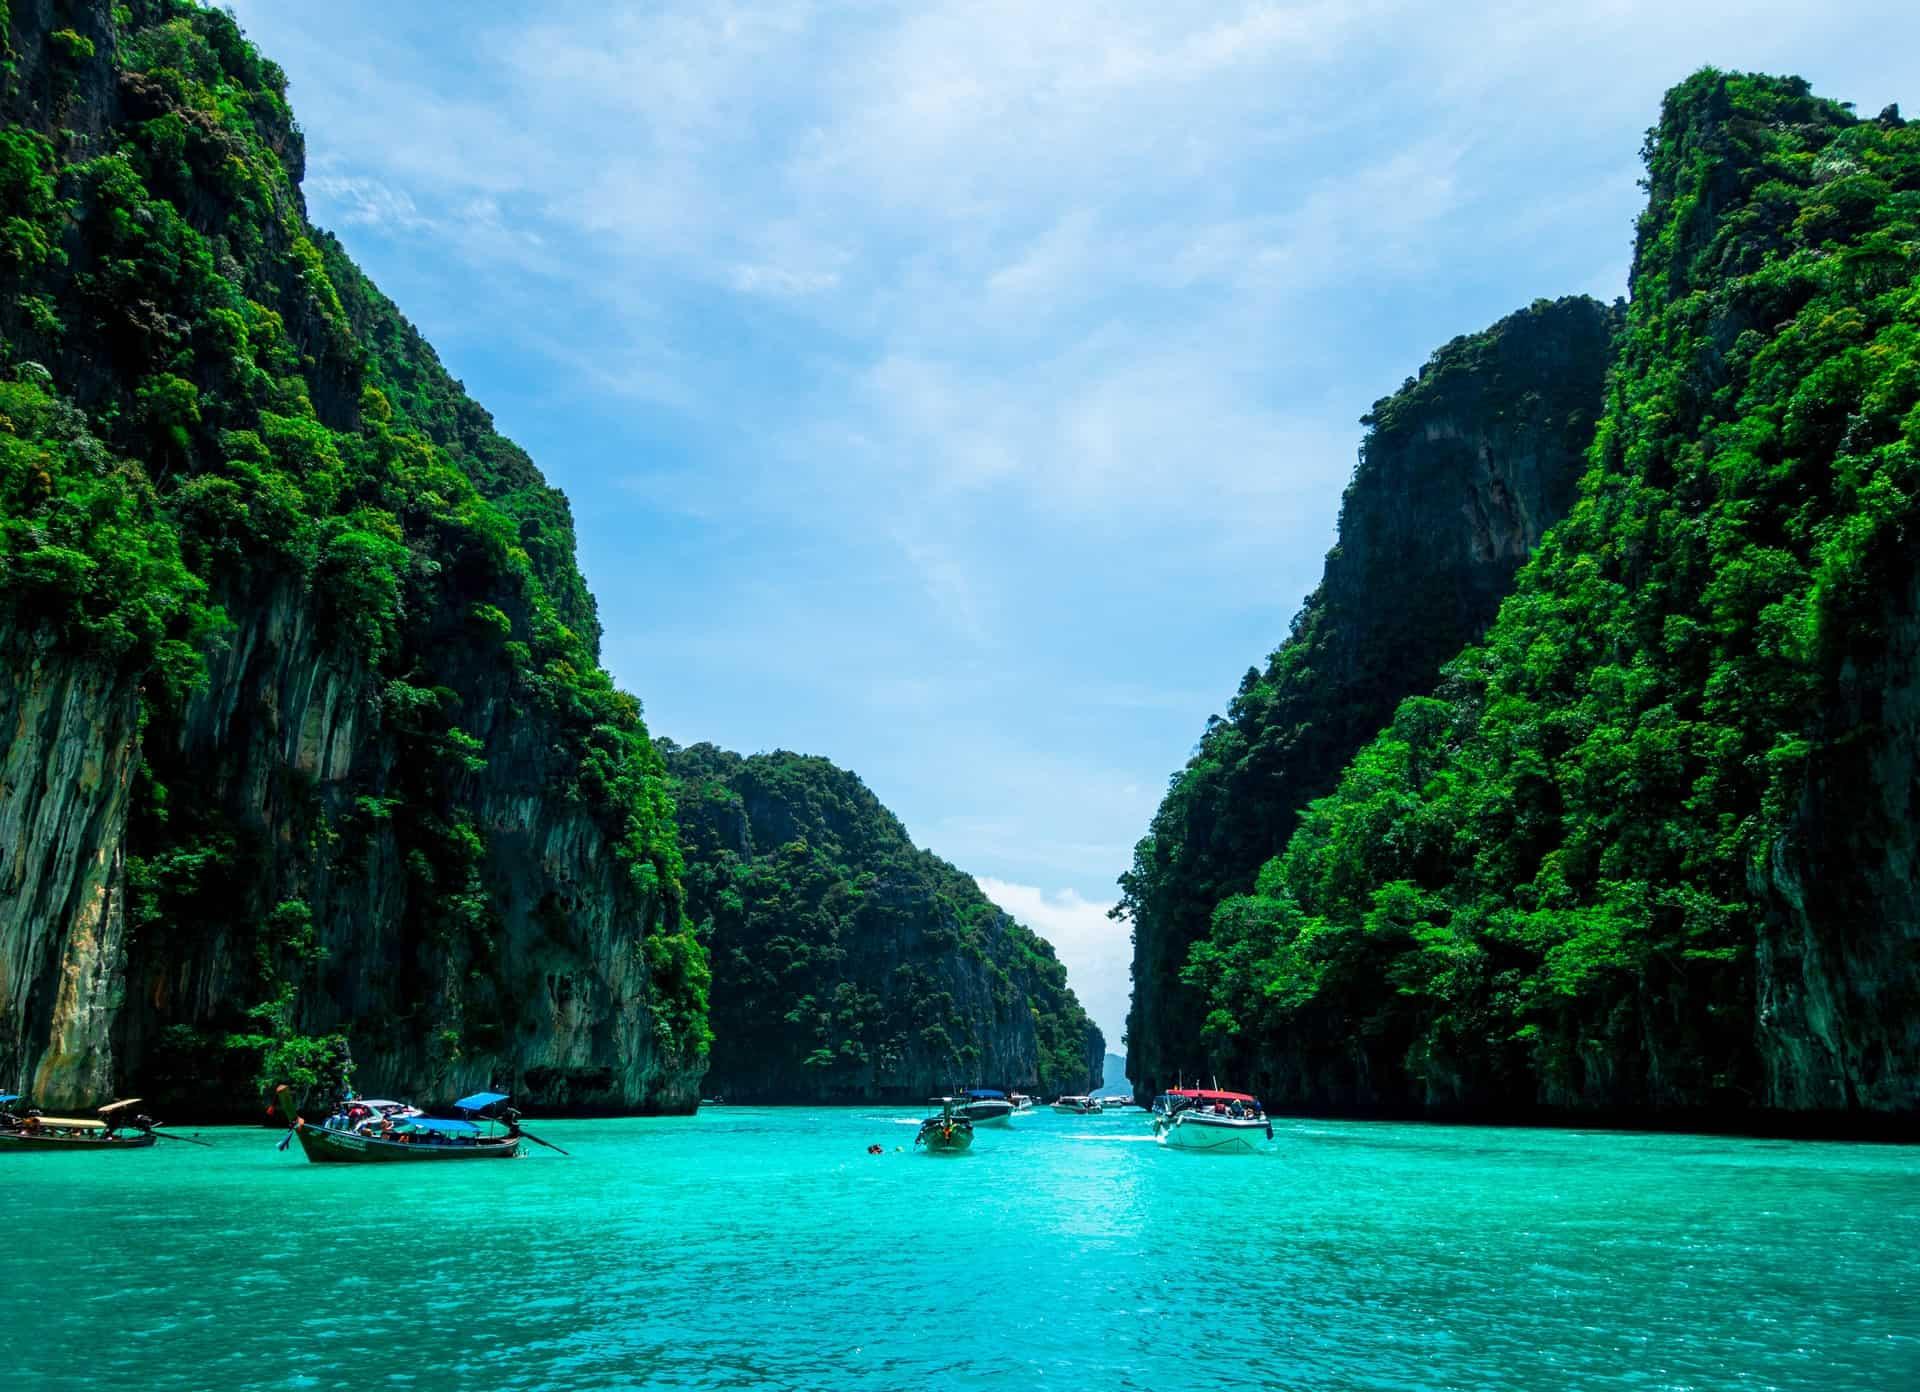 Phuket, Tailandia, se prepara para poder recibir turistas vacunados a partir de Julio